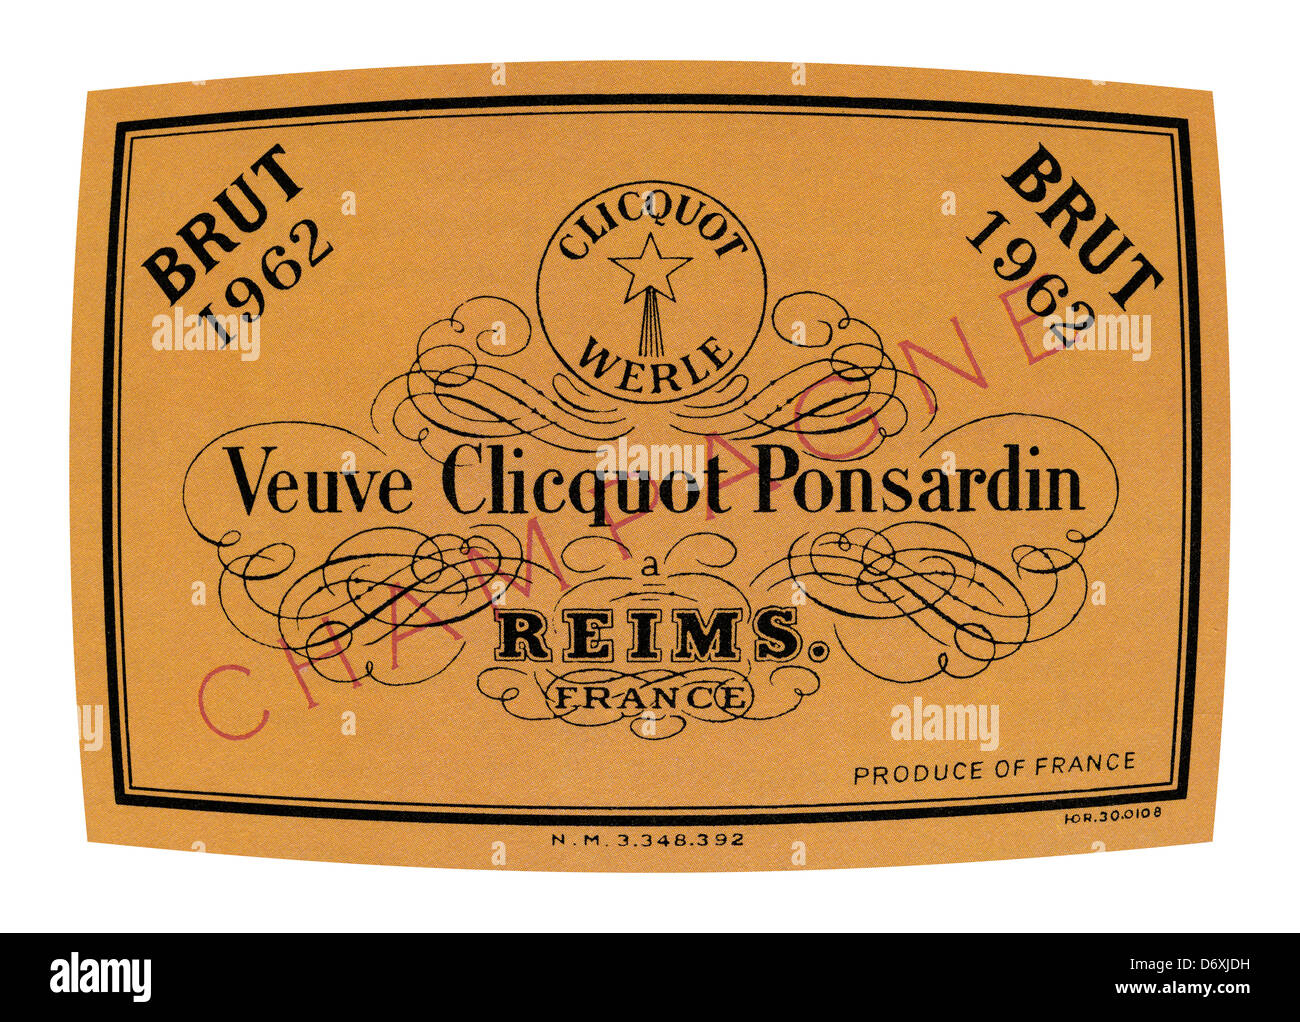 Veuve Clicquot Ponsardin Stock Photos Veuve Clicquot